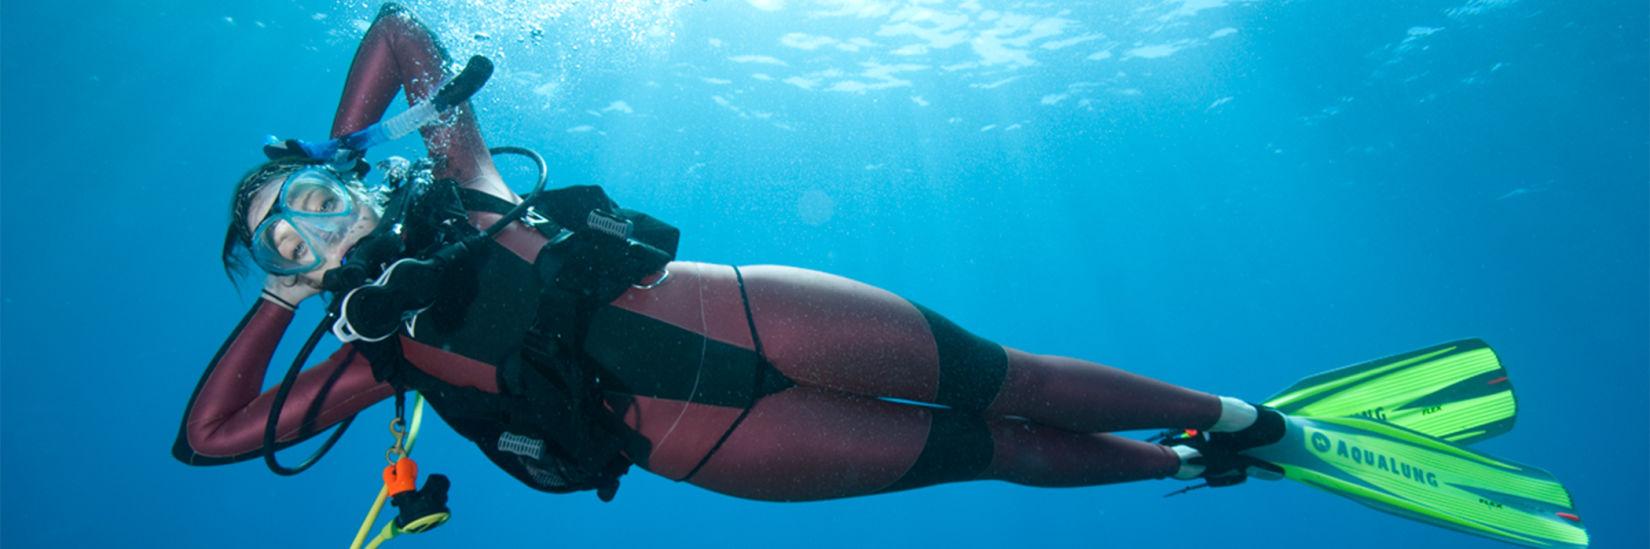 Master Scuba Diver hero